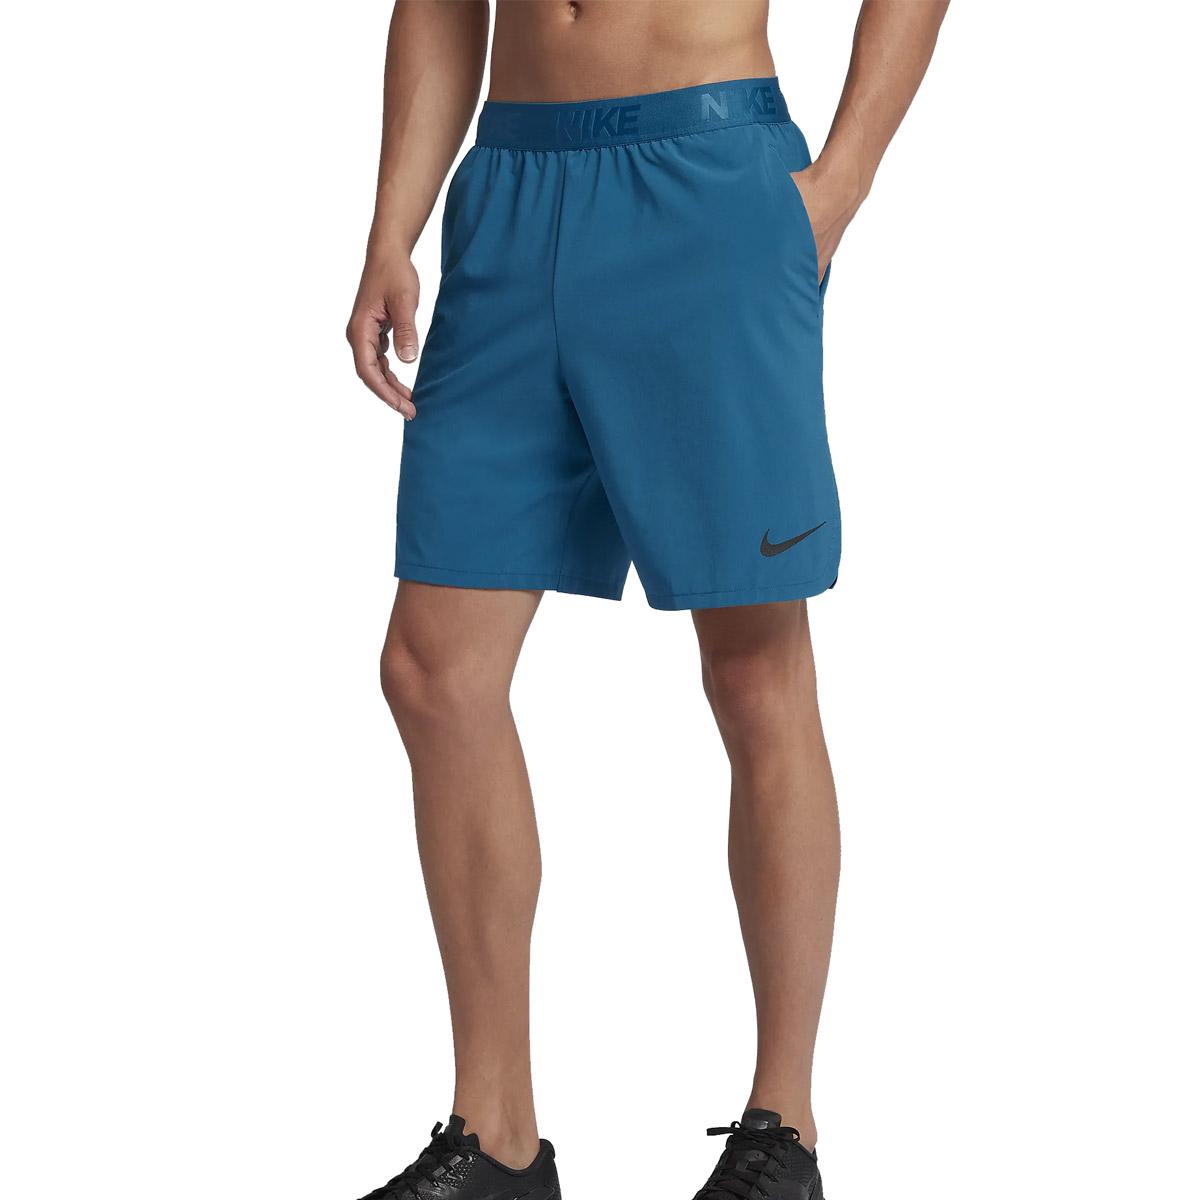 2eee27896a7bb Nike Men s Flex Woven Fitness Shorts 21cm - Green Abyss